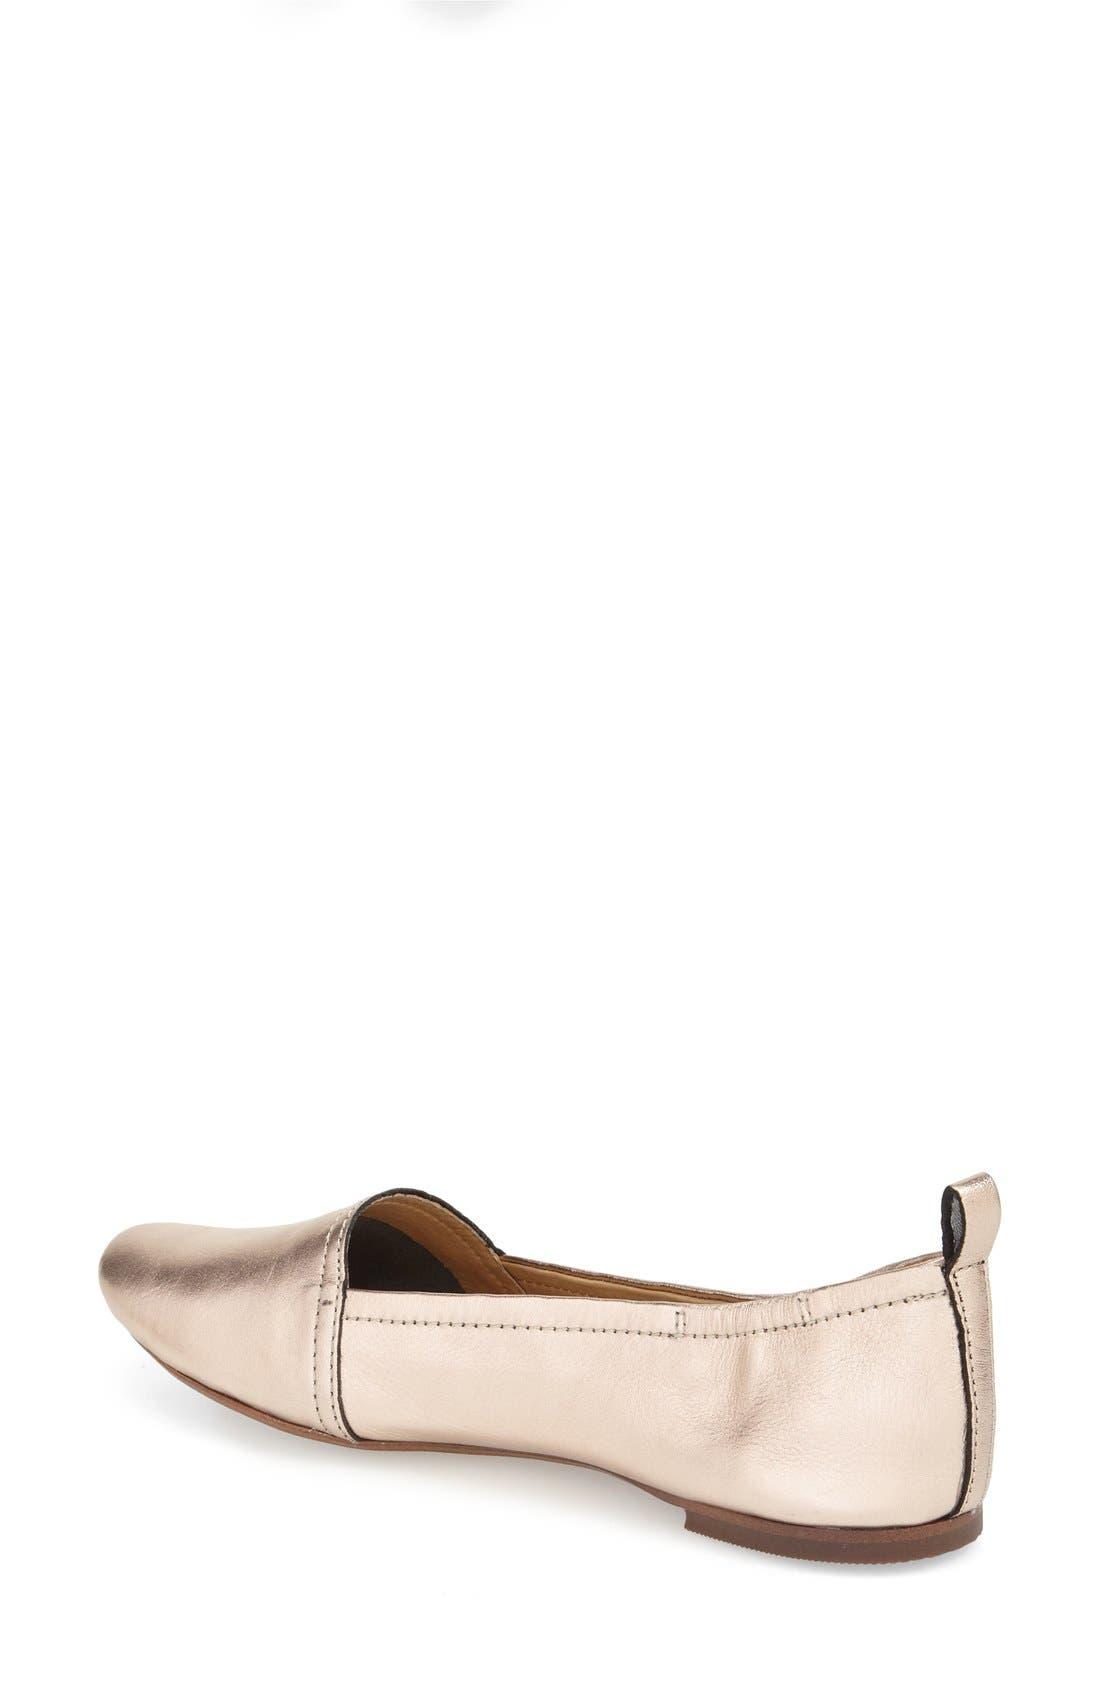 Alternate Image 2  - Latigo 'Bettie' Leather Flat (Women)